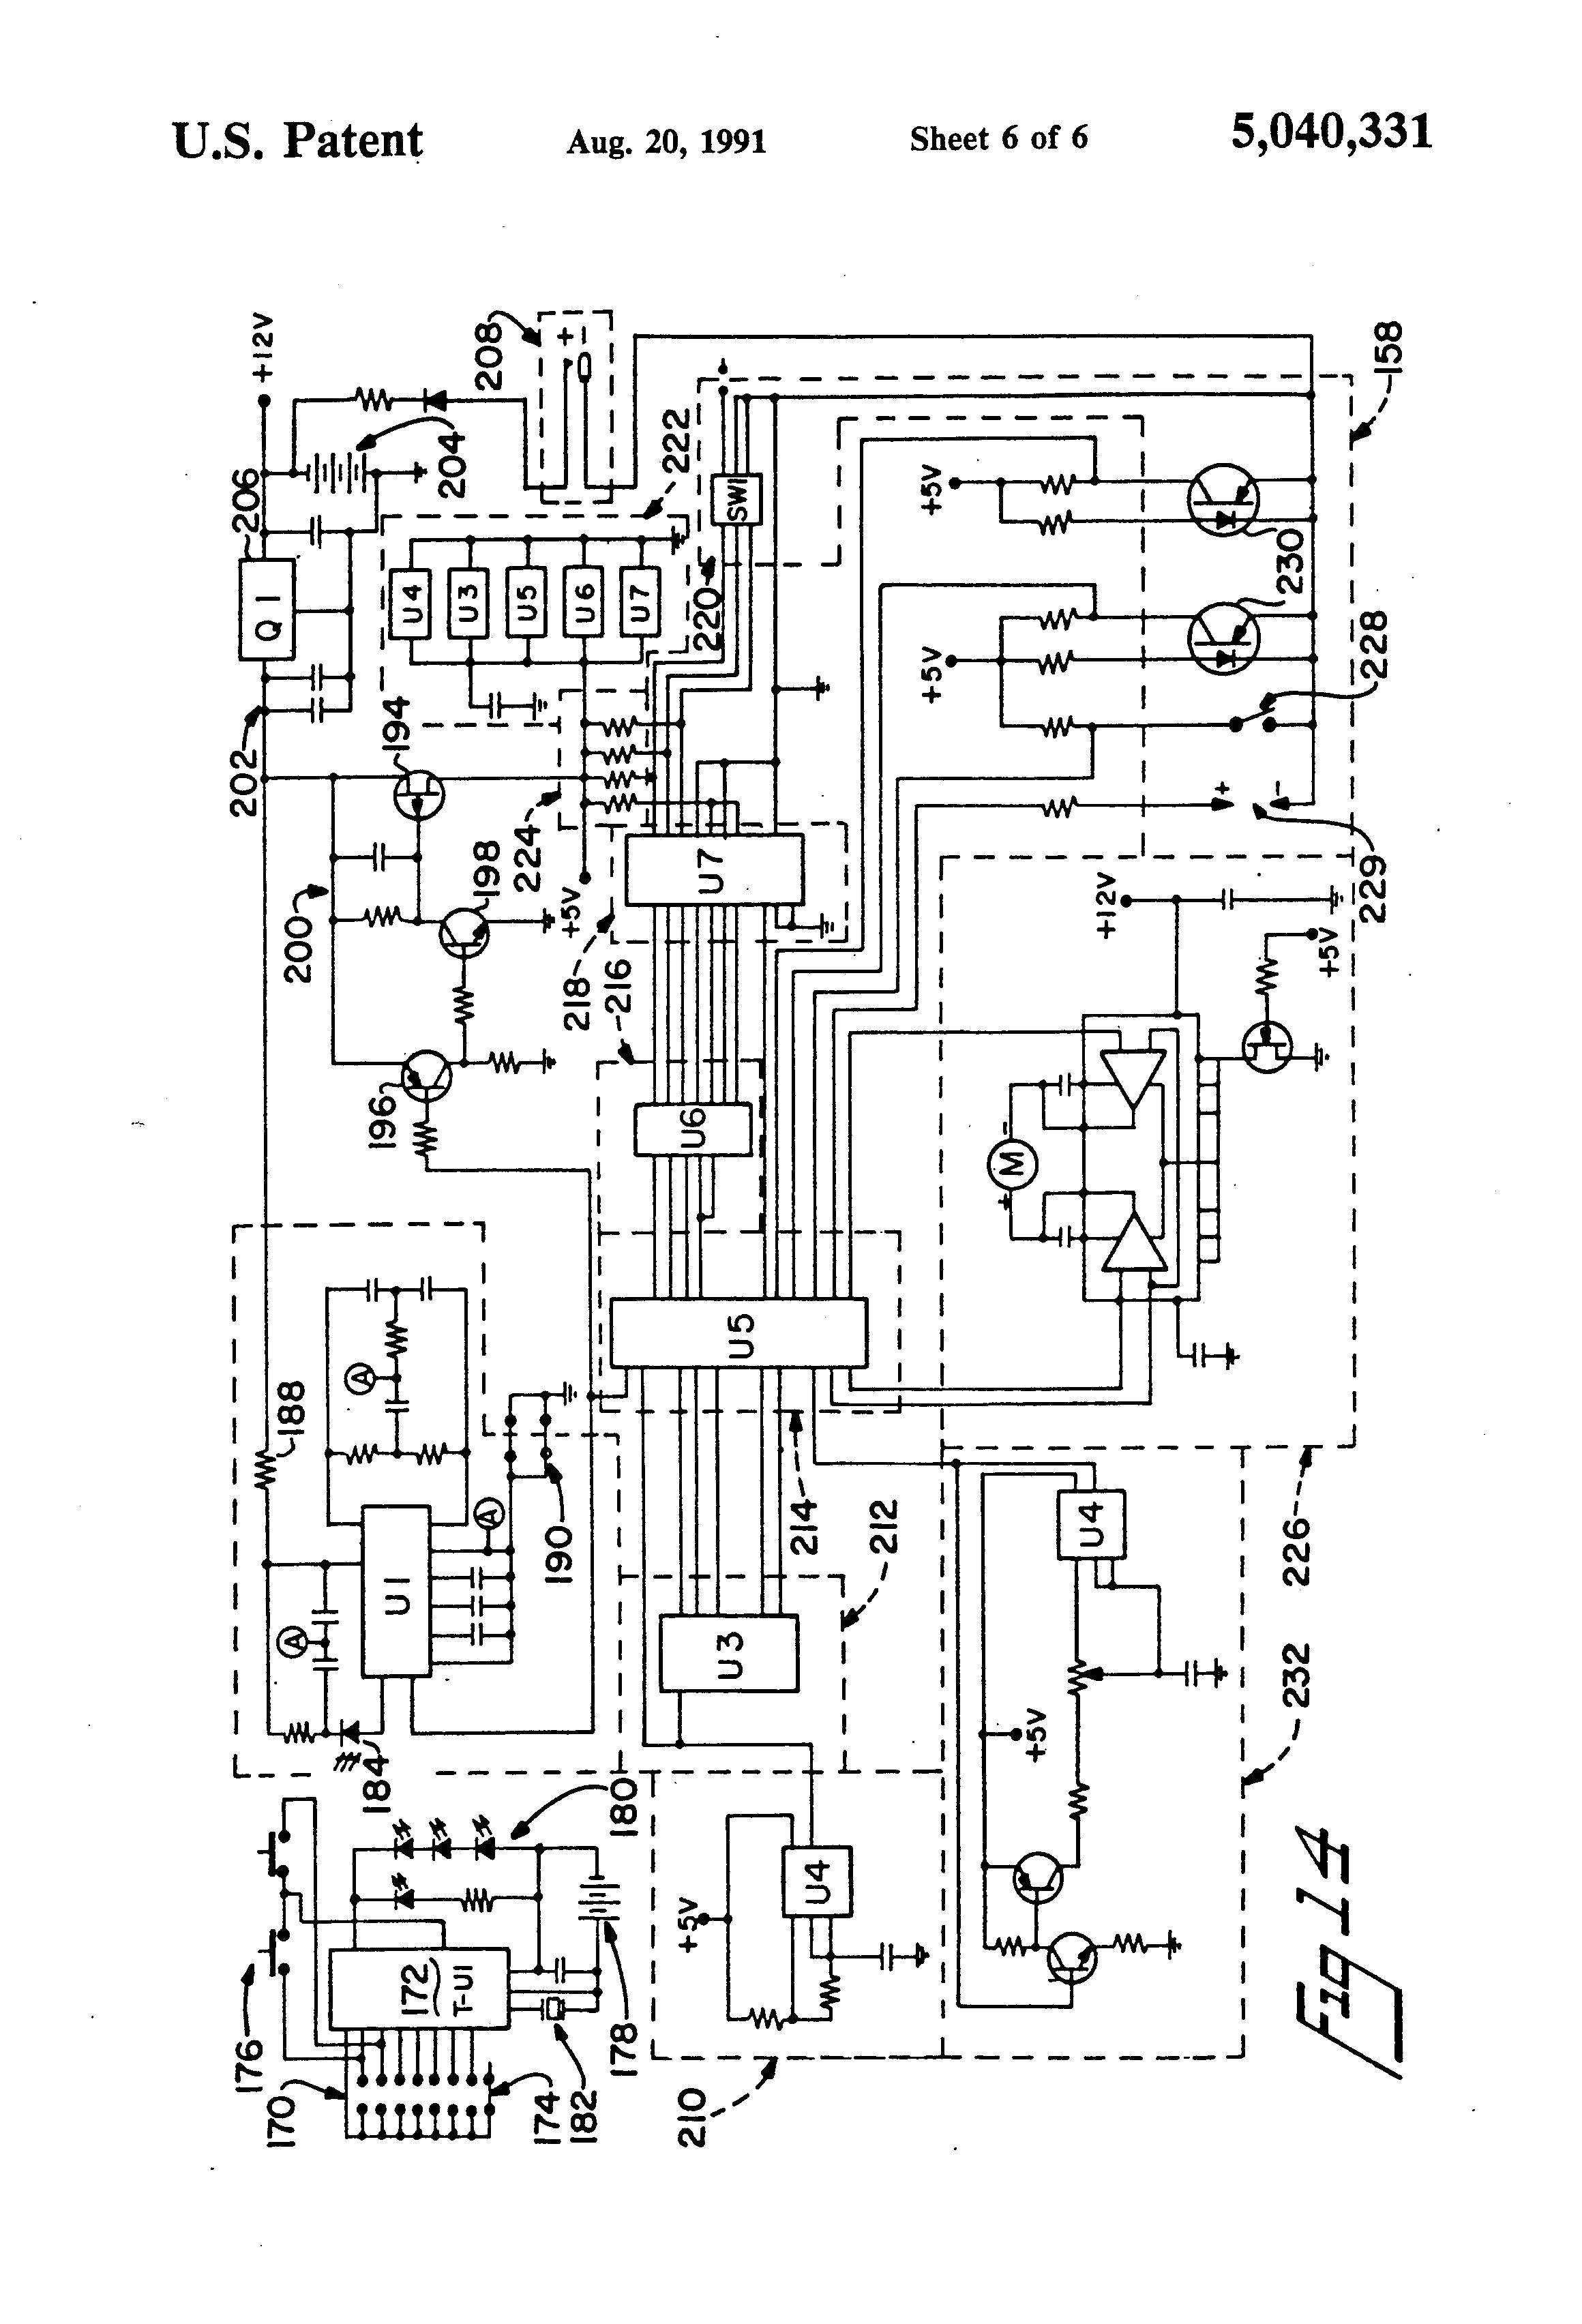 dorma automatic sliding door wiring diagram